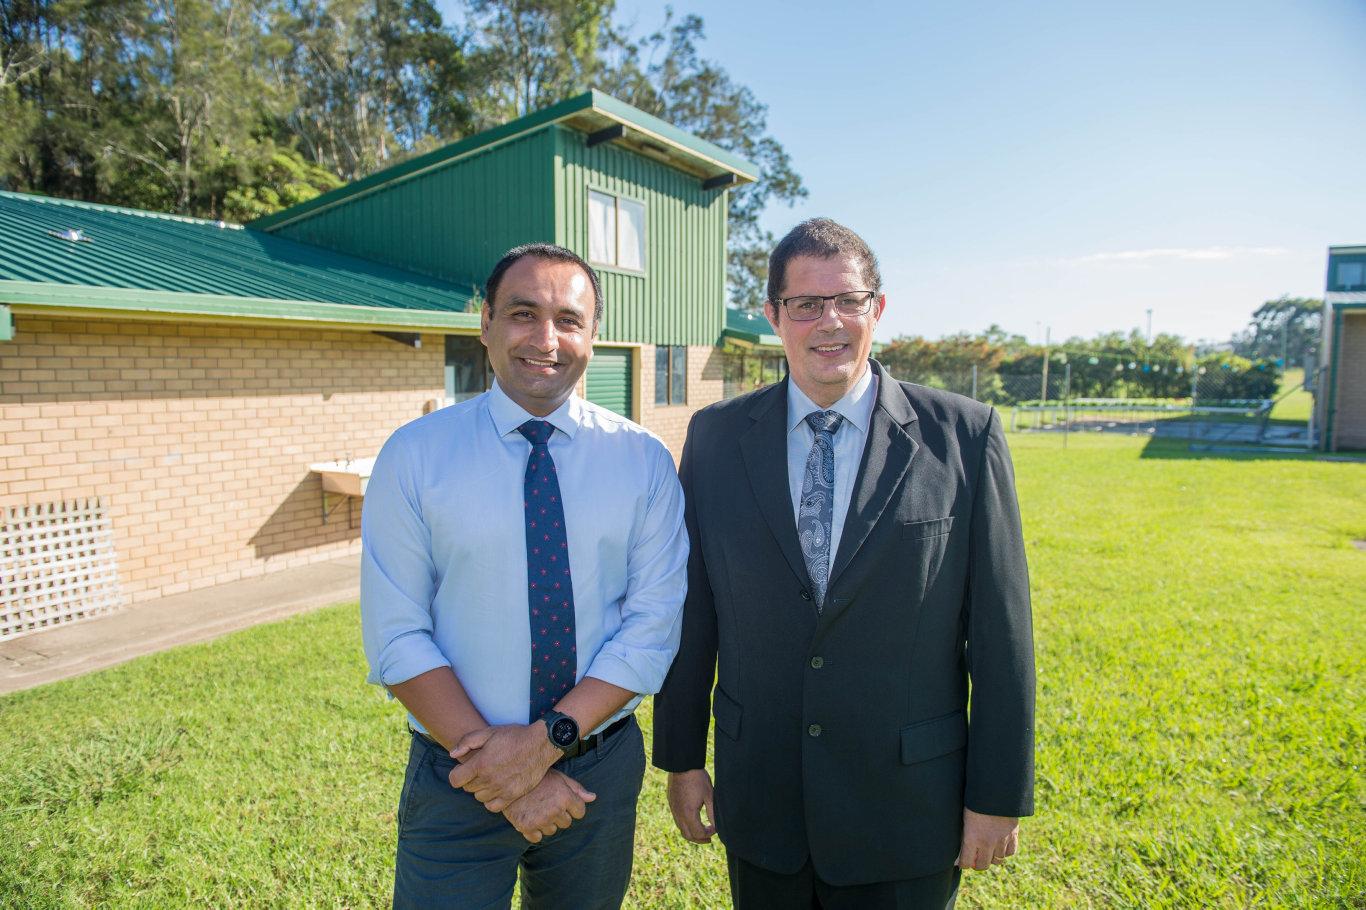 Member for Coffs Harbour Gurmesh Singh and John Paul College principal Michael Carniato at the building site.